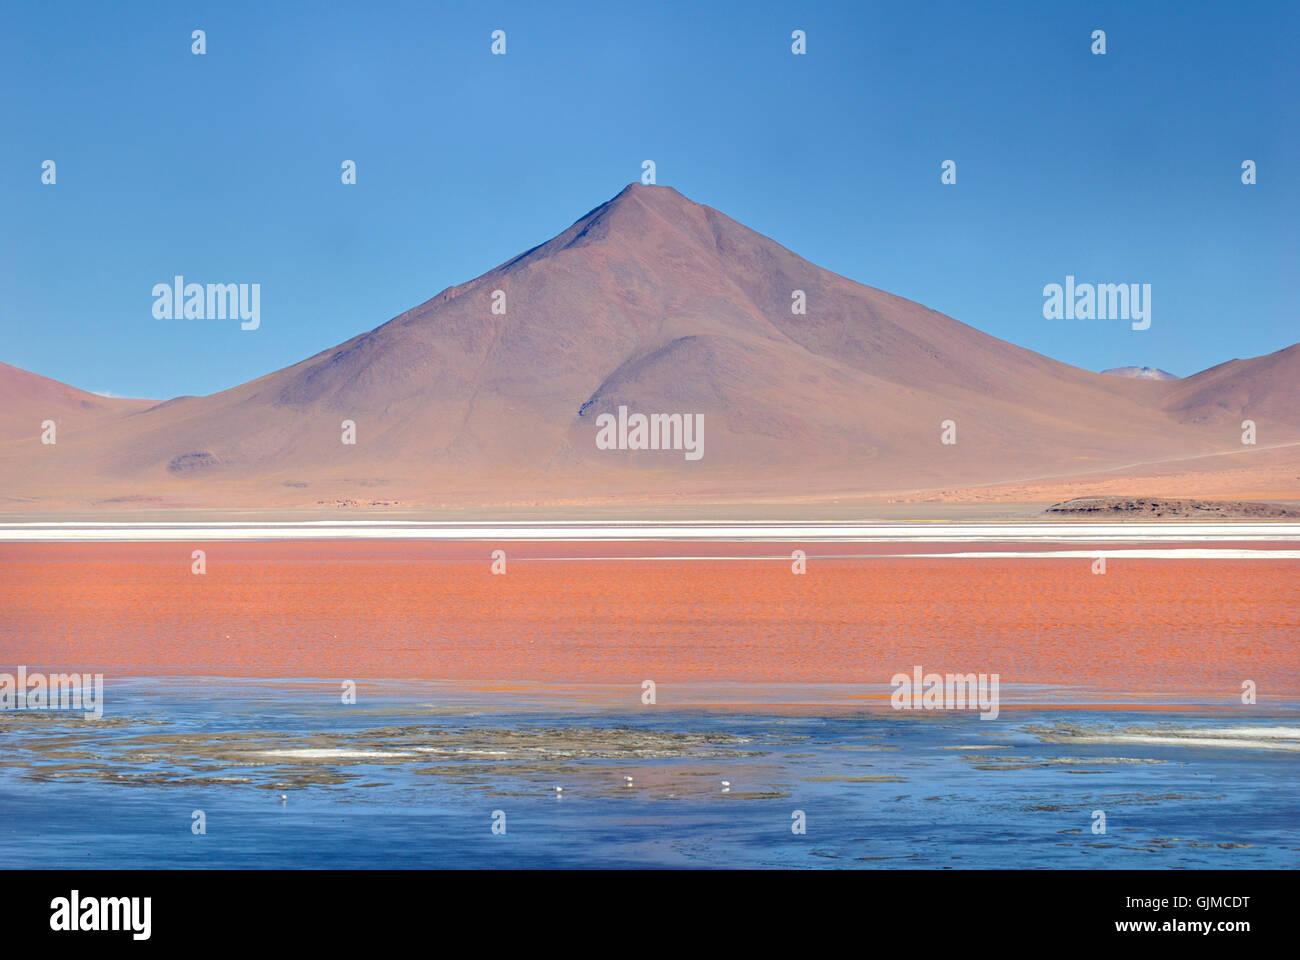 volcano at laguna colorada - Stock Image